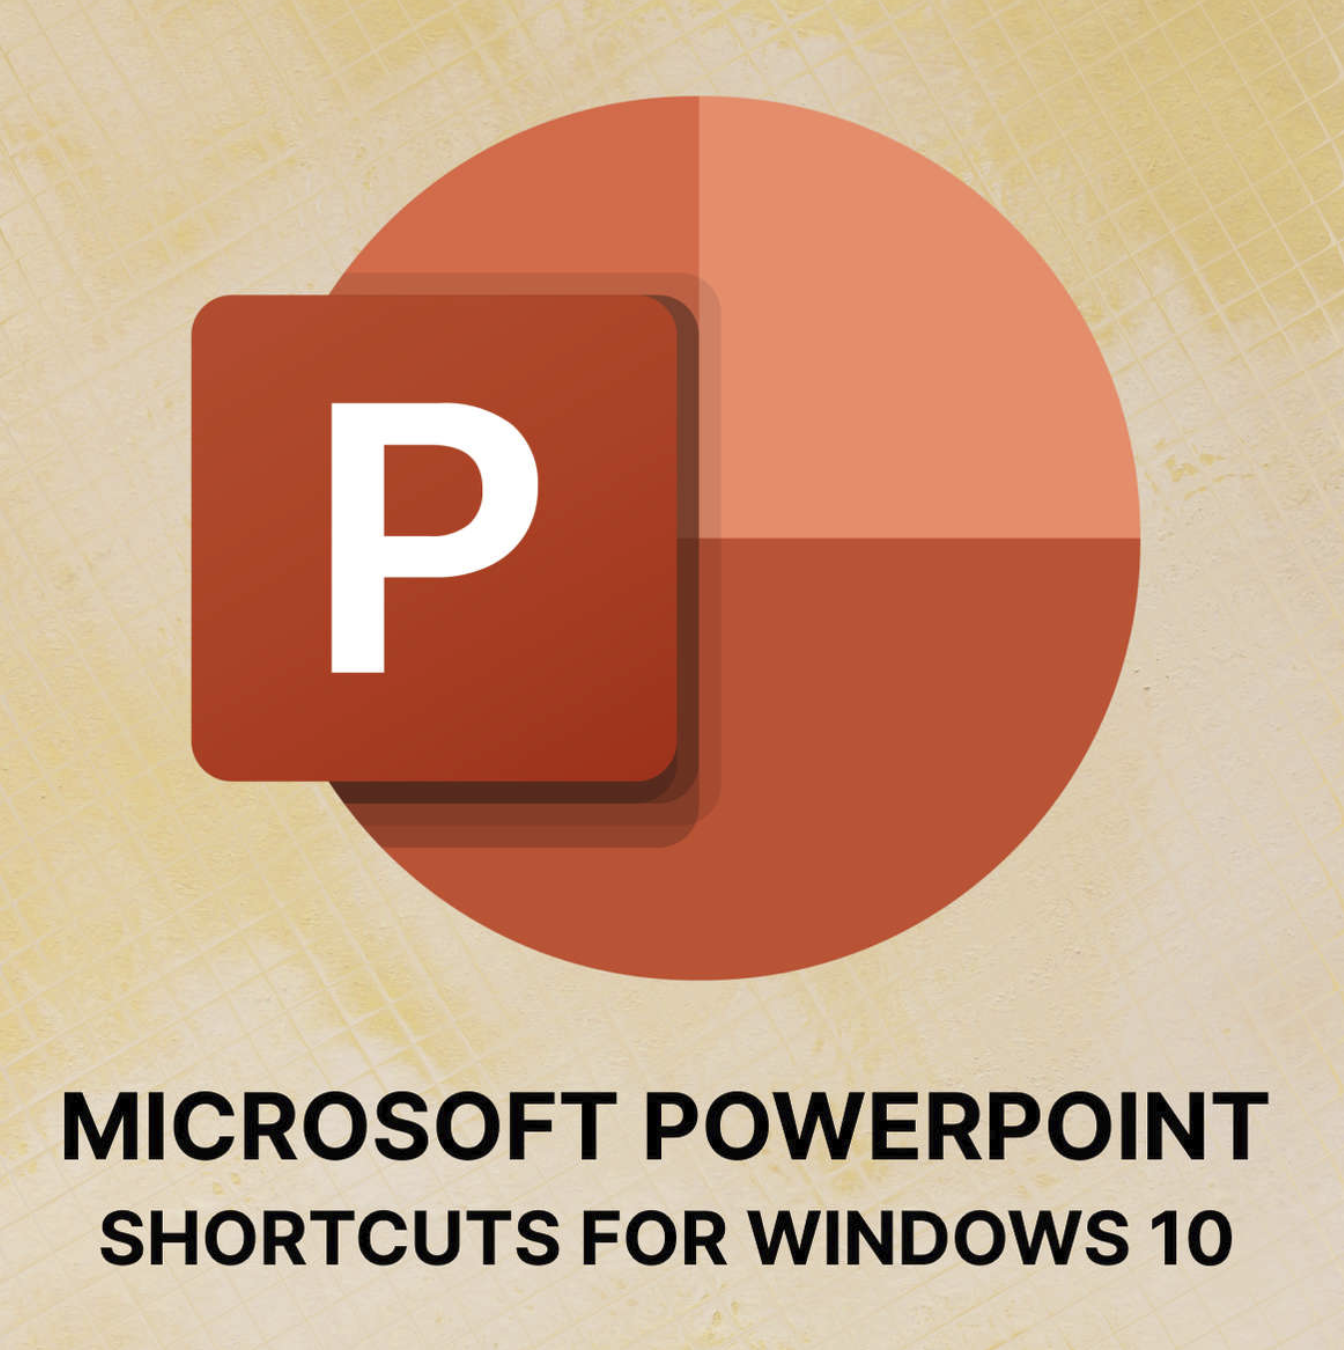 Cheat Sheet of Microsoft PowerPoint Keyboard Shortcuts for Windows